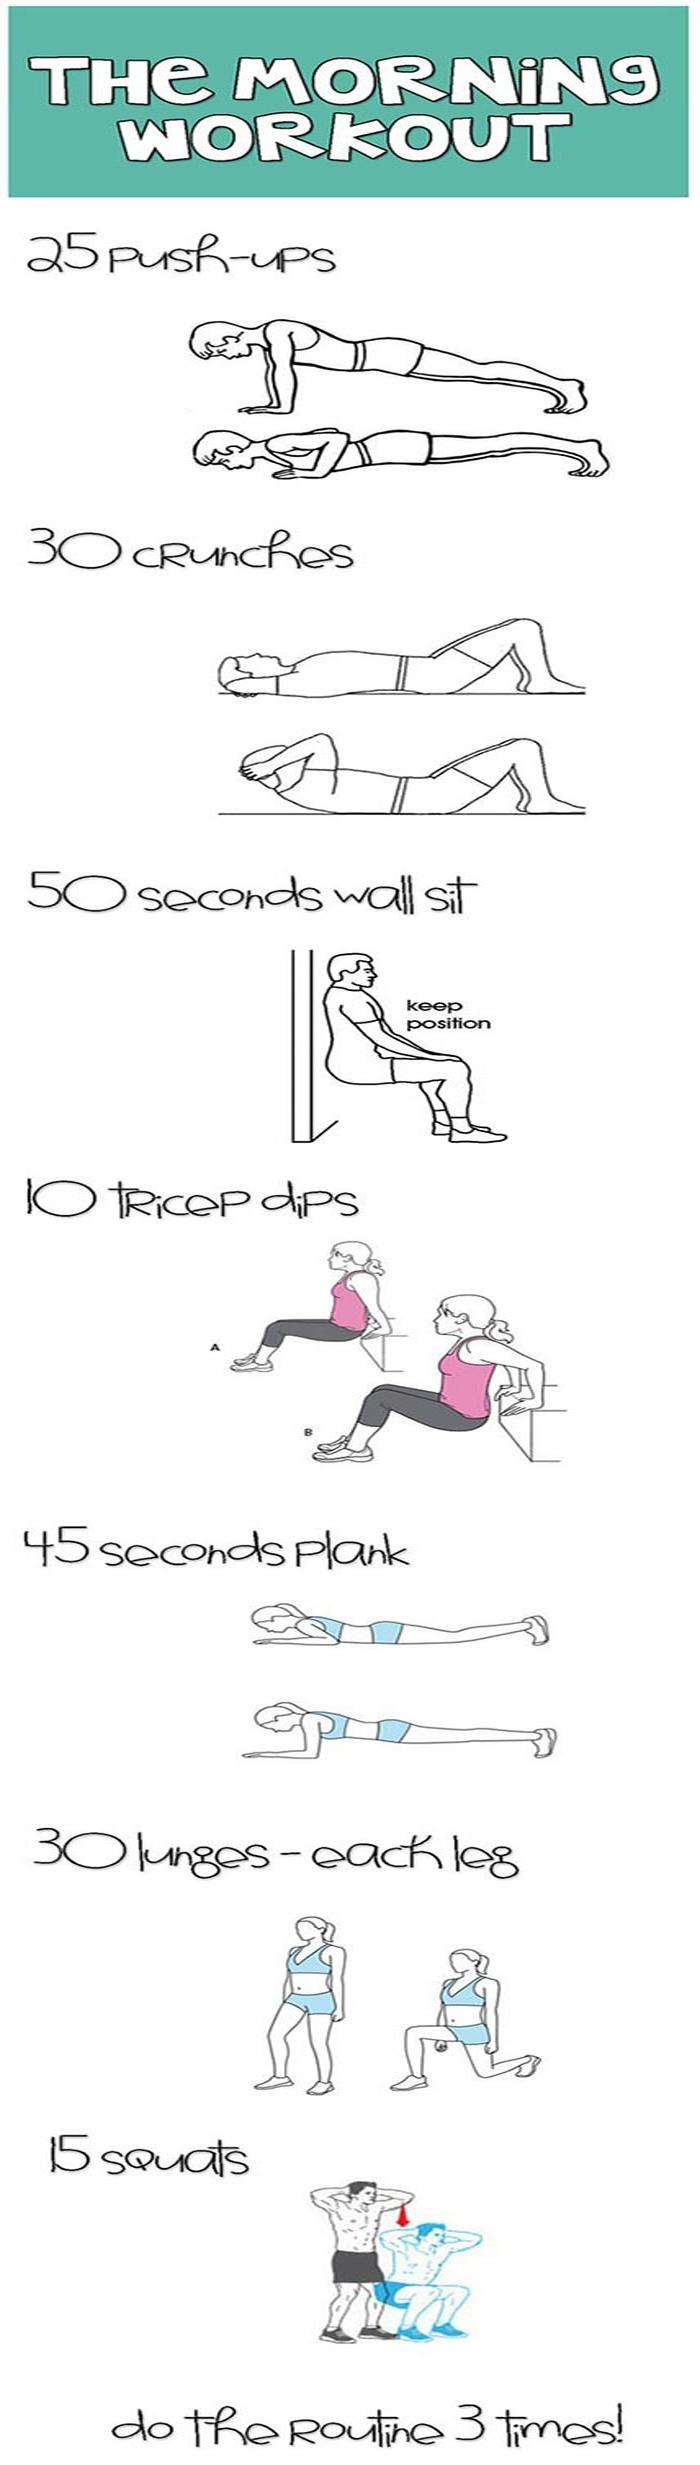 morning-work-out,morning workout,morning workout,,morning, workout,good morning workout,,good morning